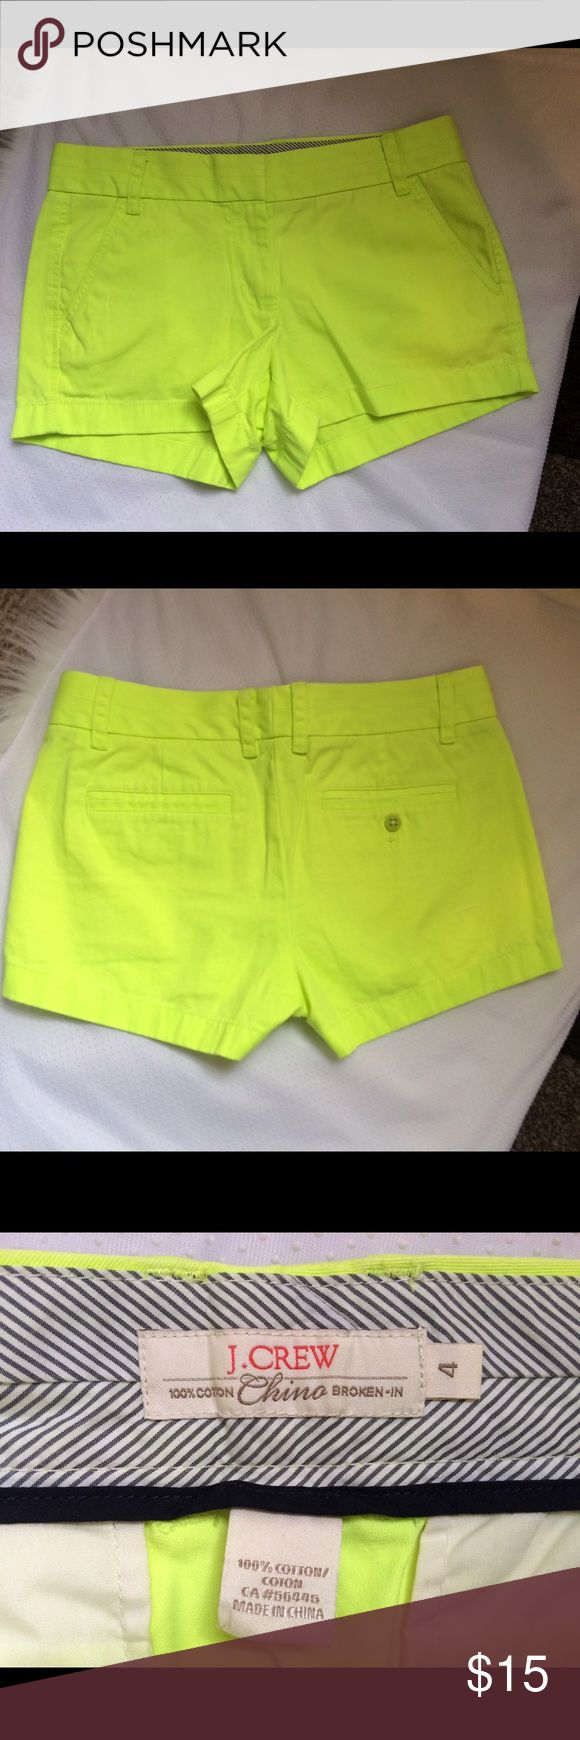 J. Crew chino shorts highlighter neon yellow sz 4 J. Crew chino shorts highlighter neon yellow sz 4 like new cond J. Crew Shorts